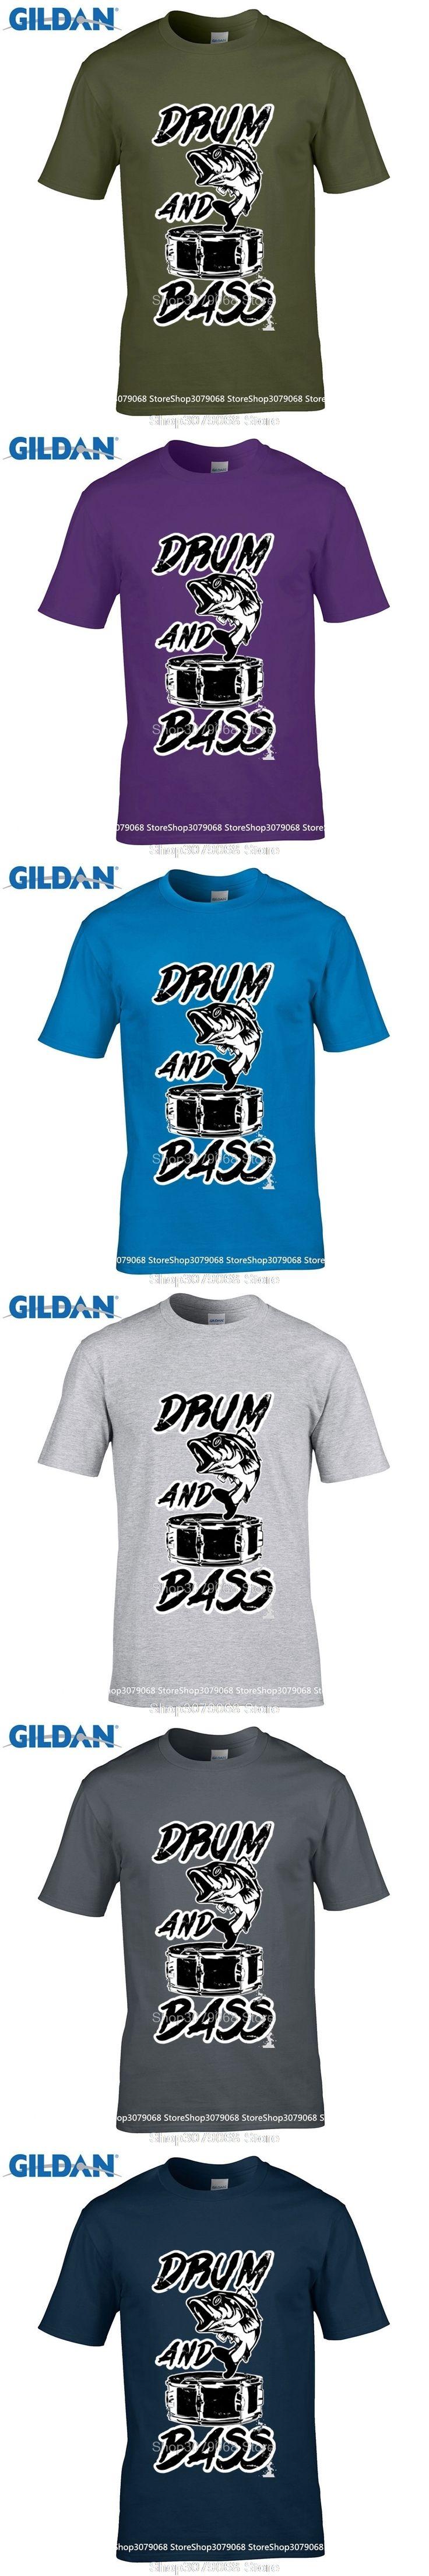 GILDAN Game Shirt Short Crew Neck Drum Bass Fish Jumping Out Of A Speaker Dance Music Gift Present Zomer Mens T Shirts